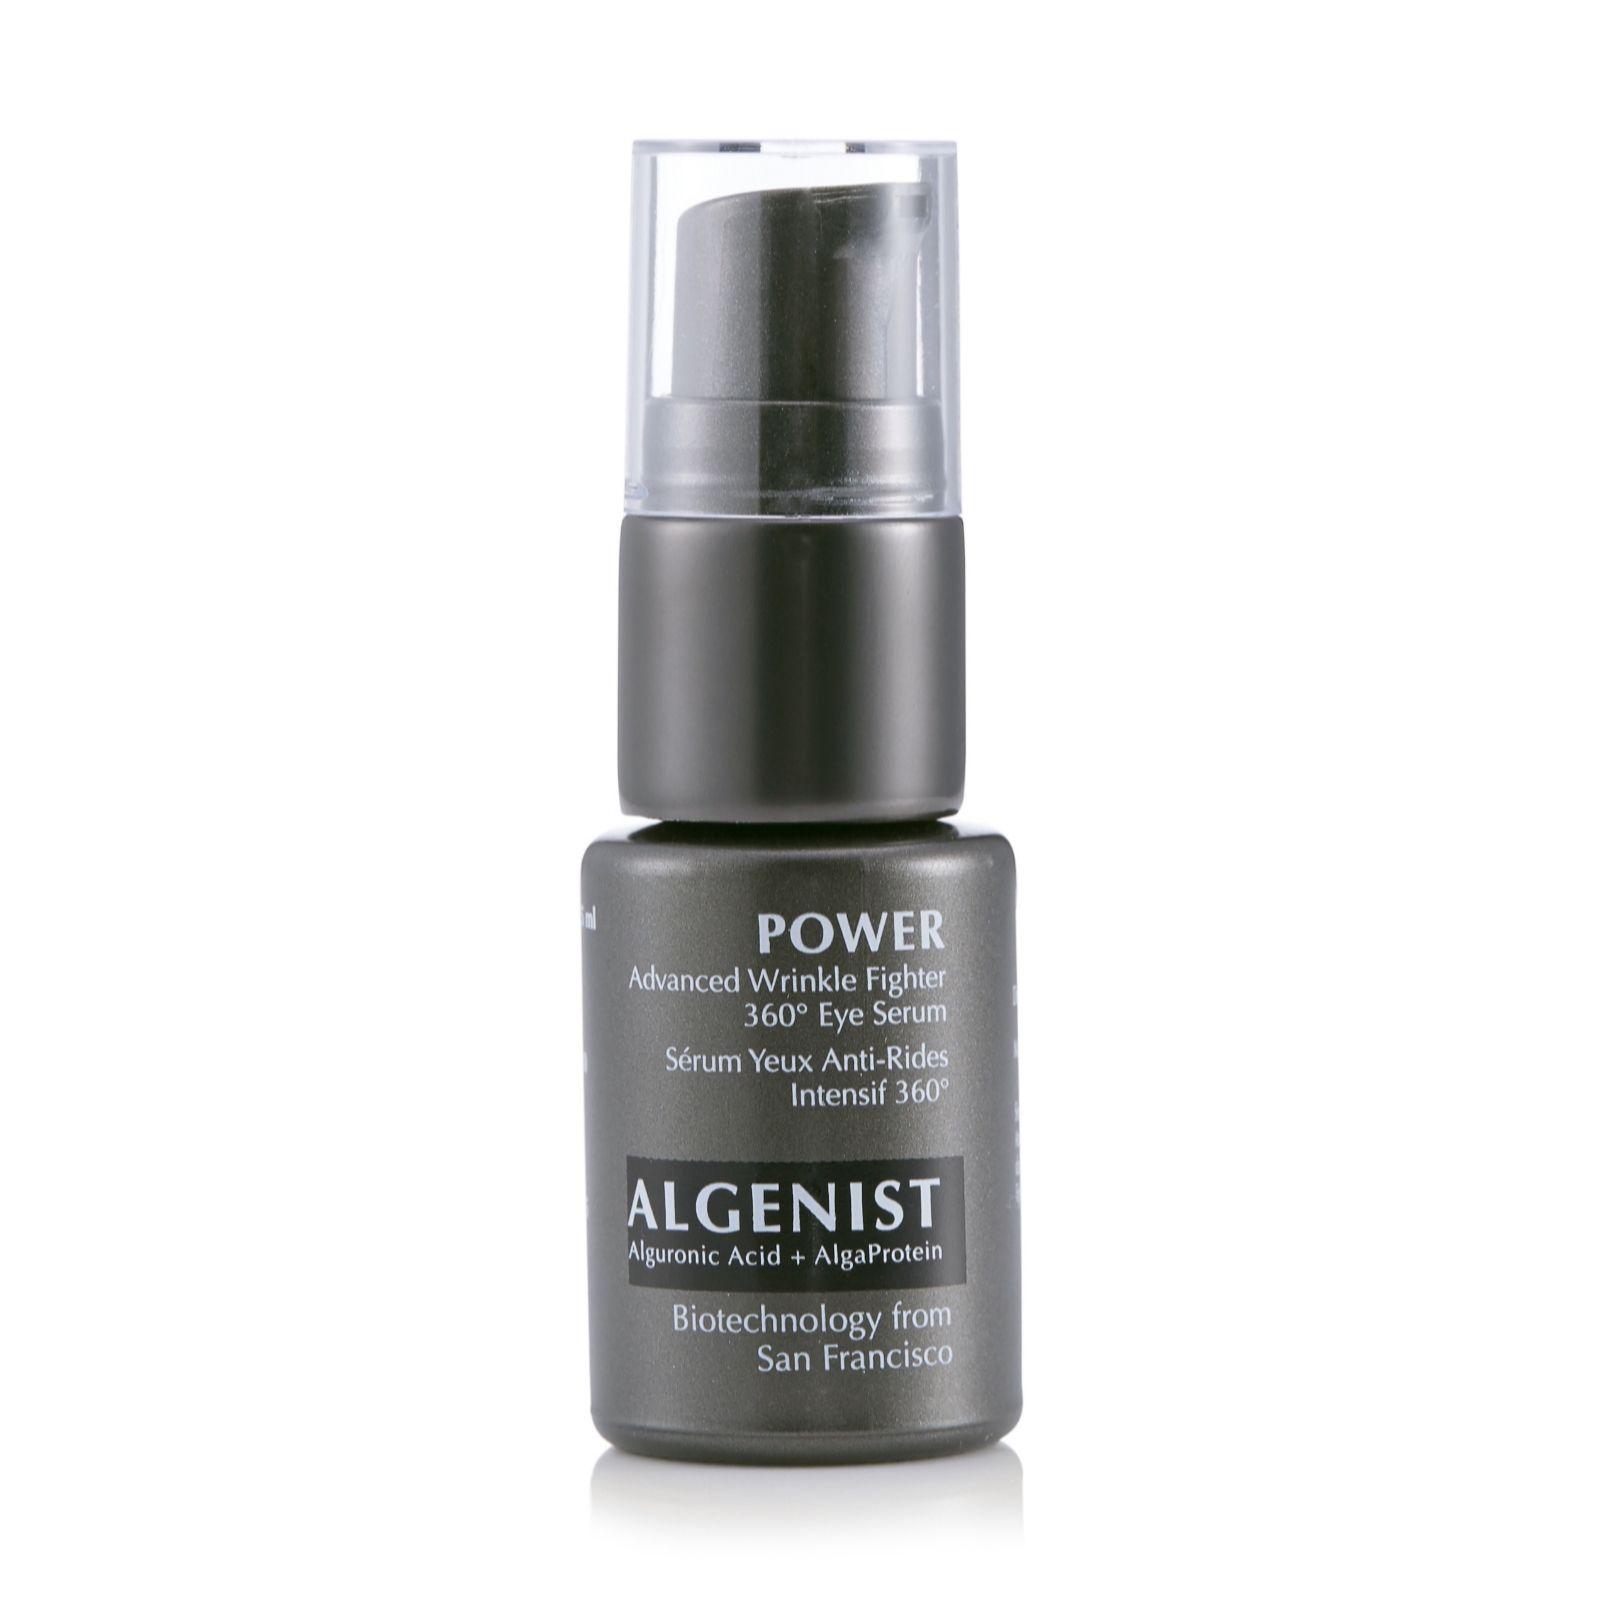 algenist power eye serum reviews